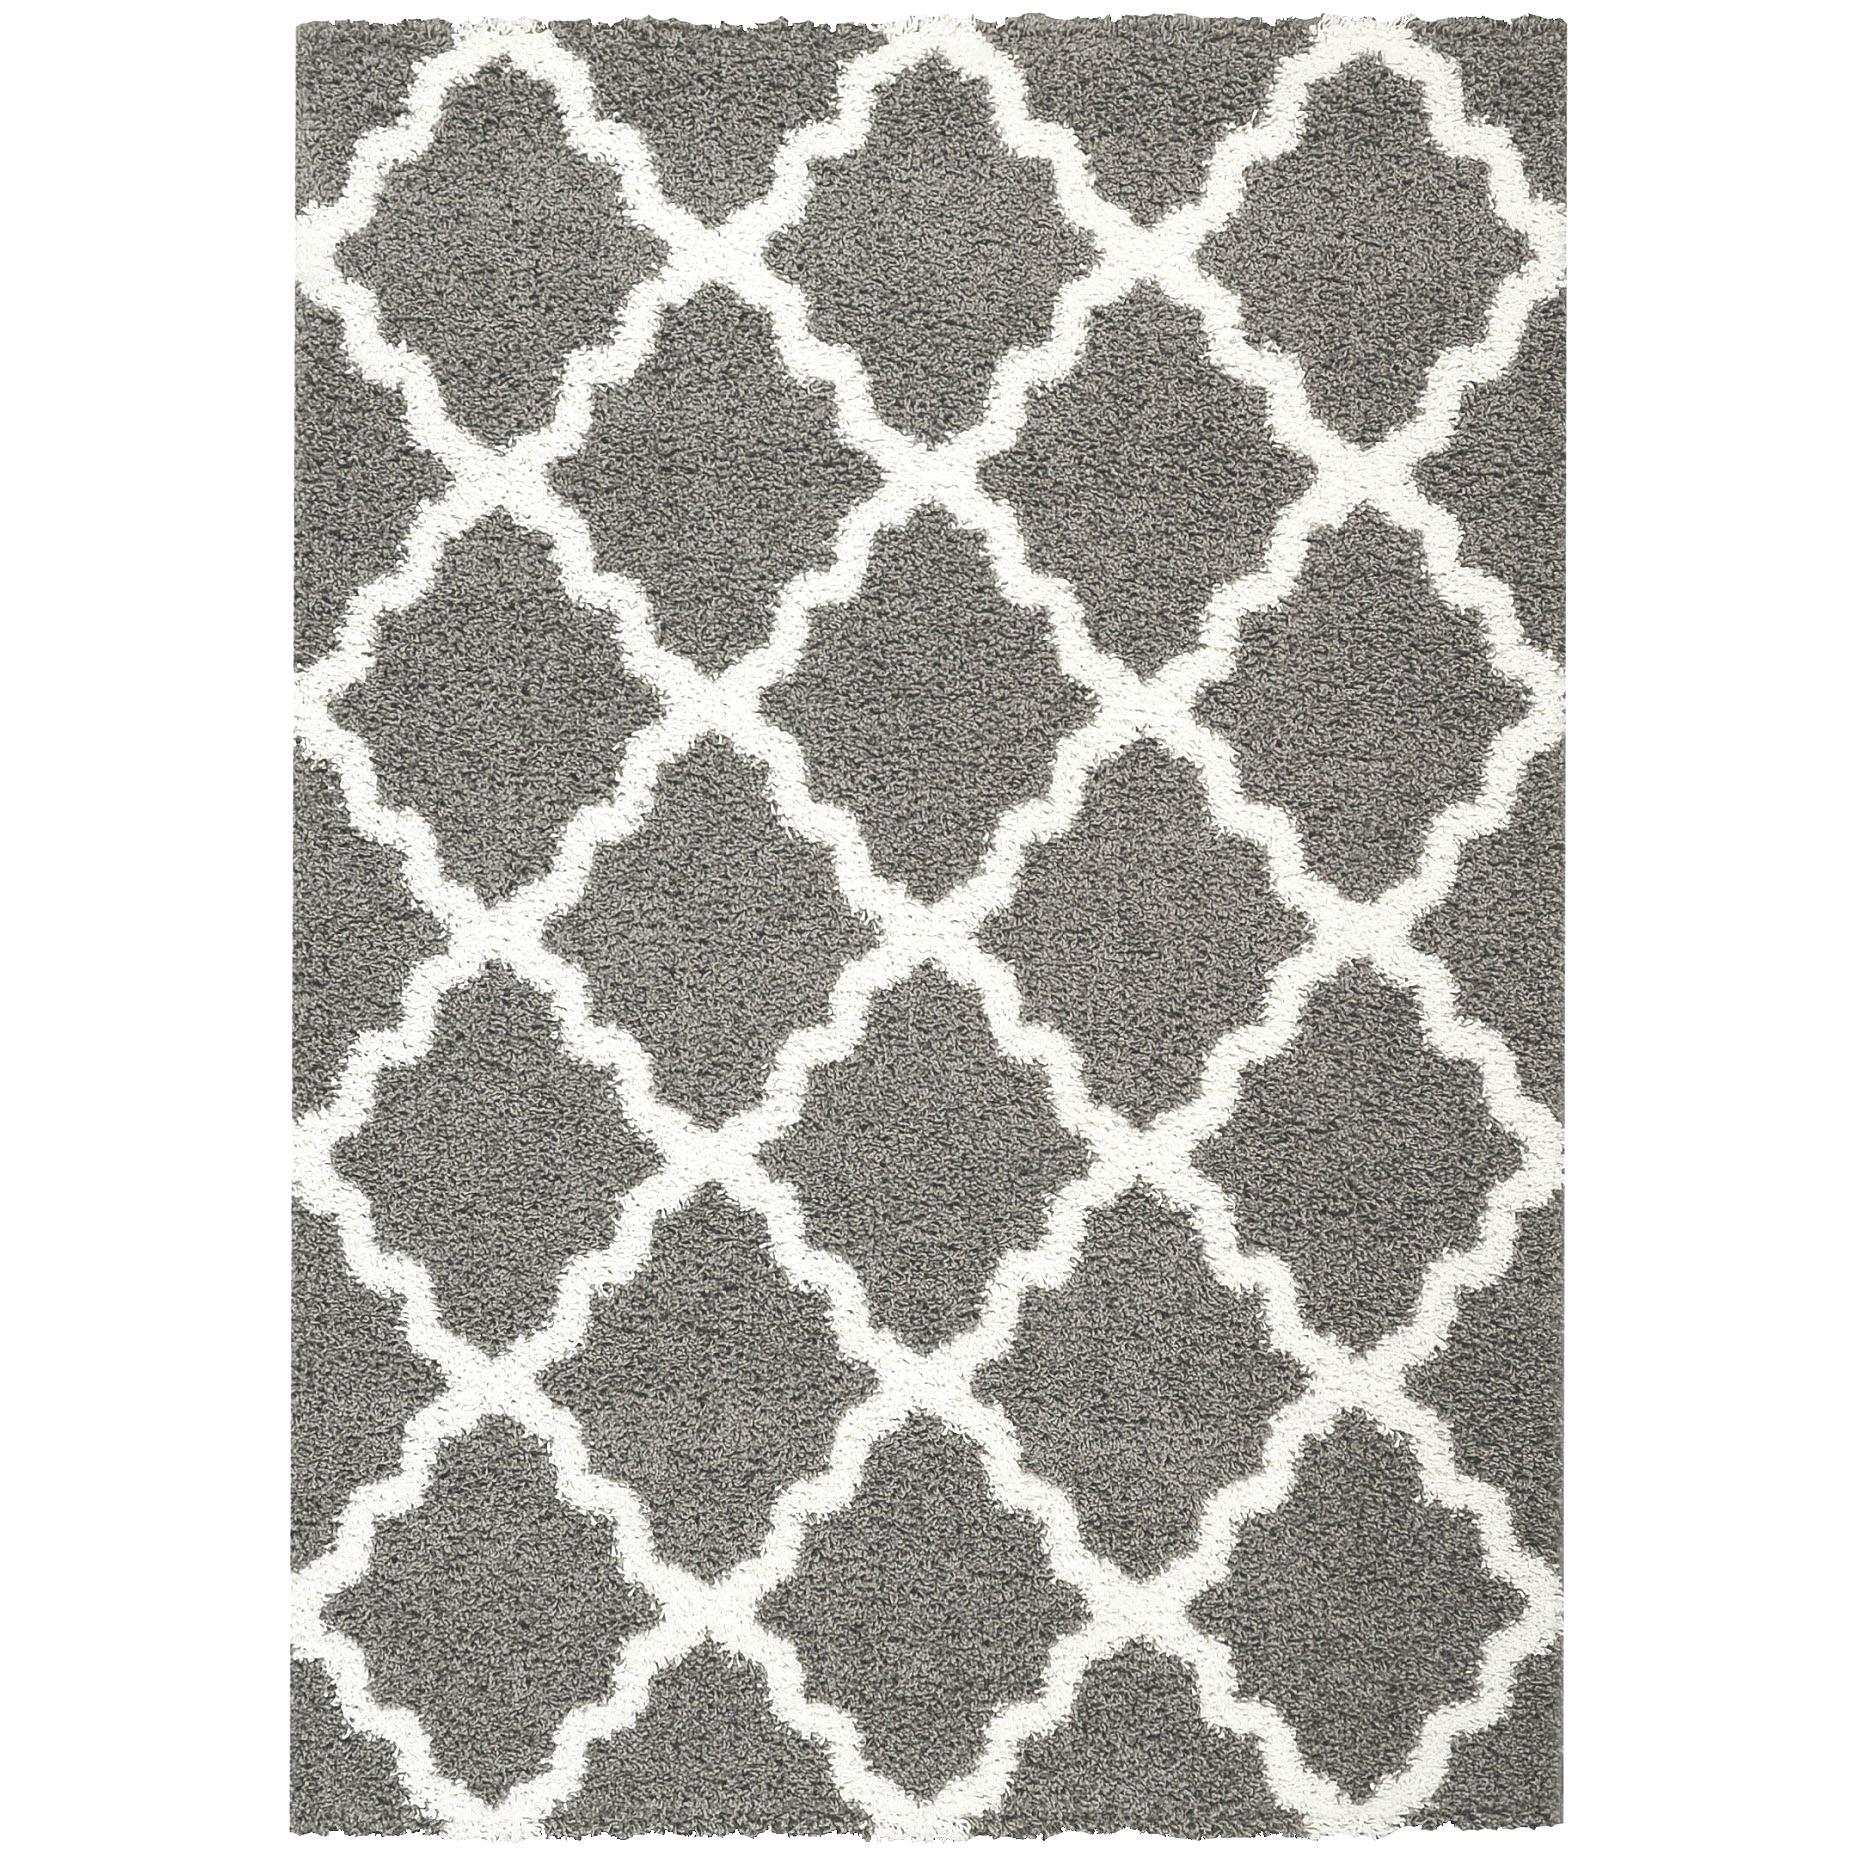 Cozy Rugnur Bella Maxy Home Moroccan Trellis Contemporary Gray/White Shag Area  Rug white and gray shag rug